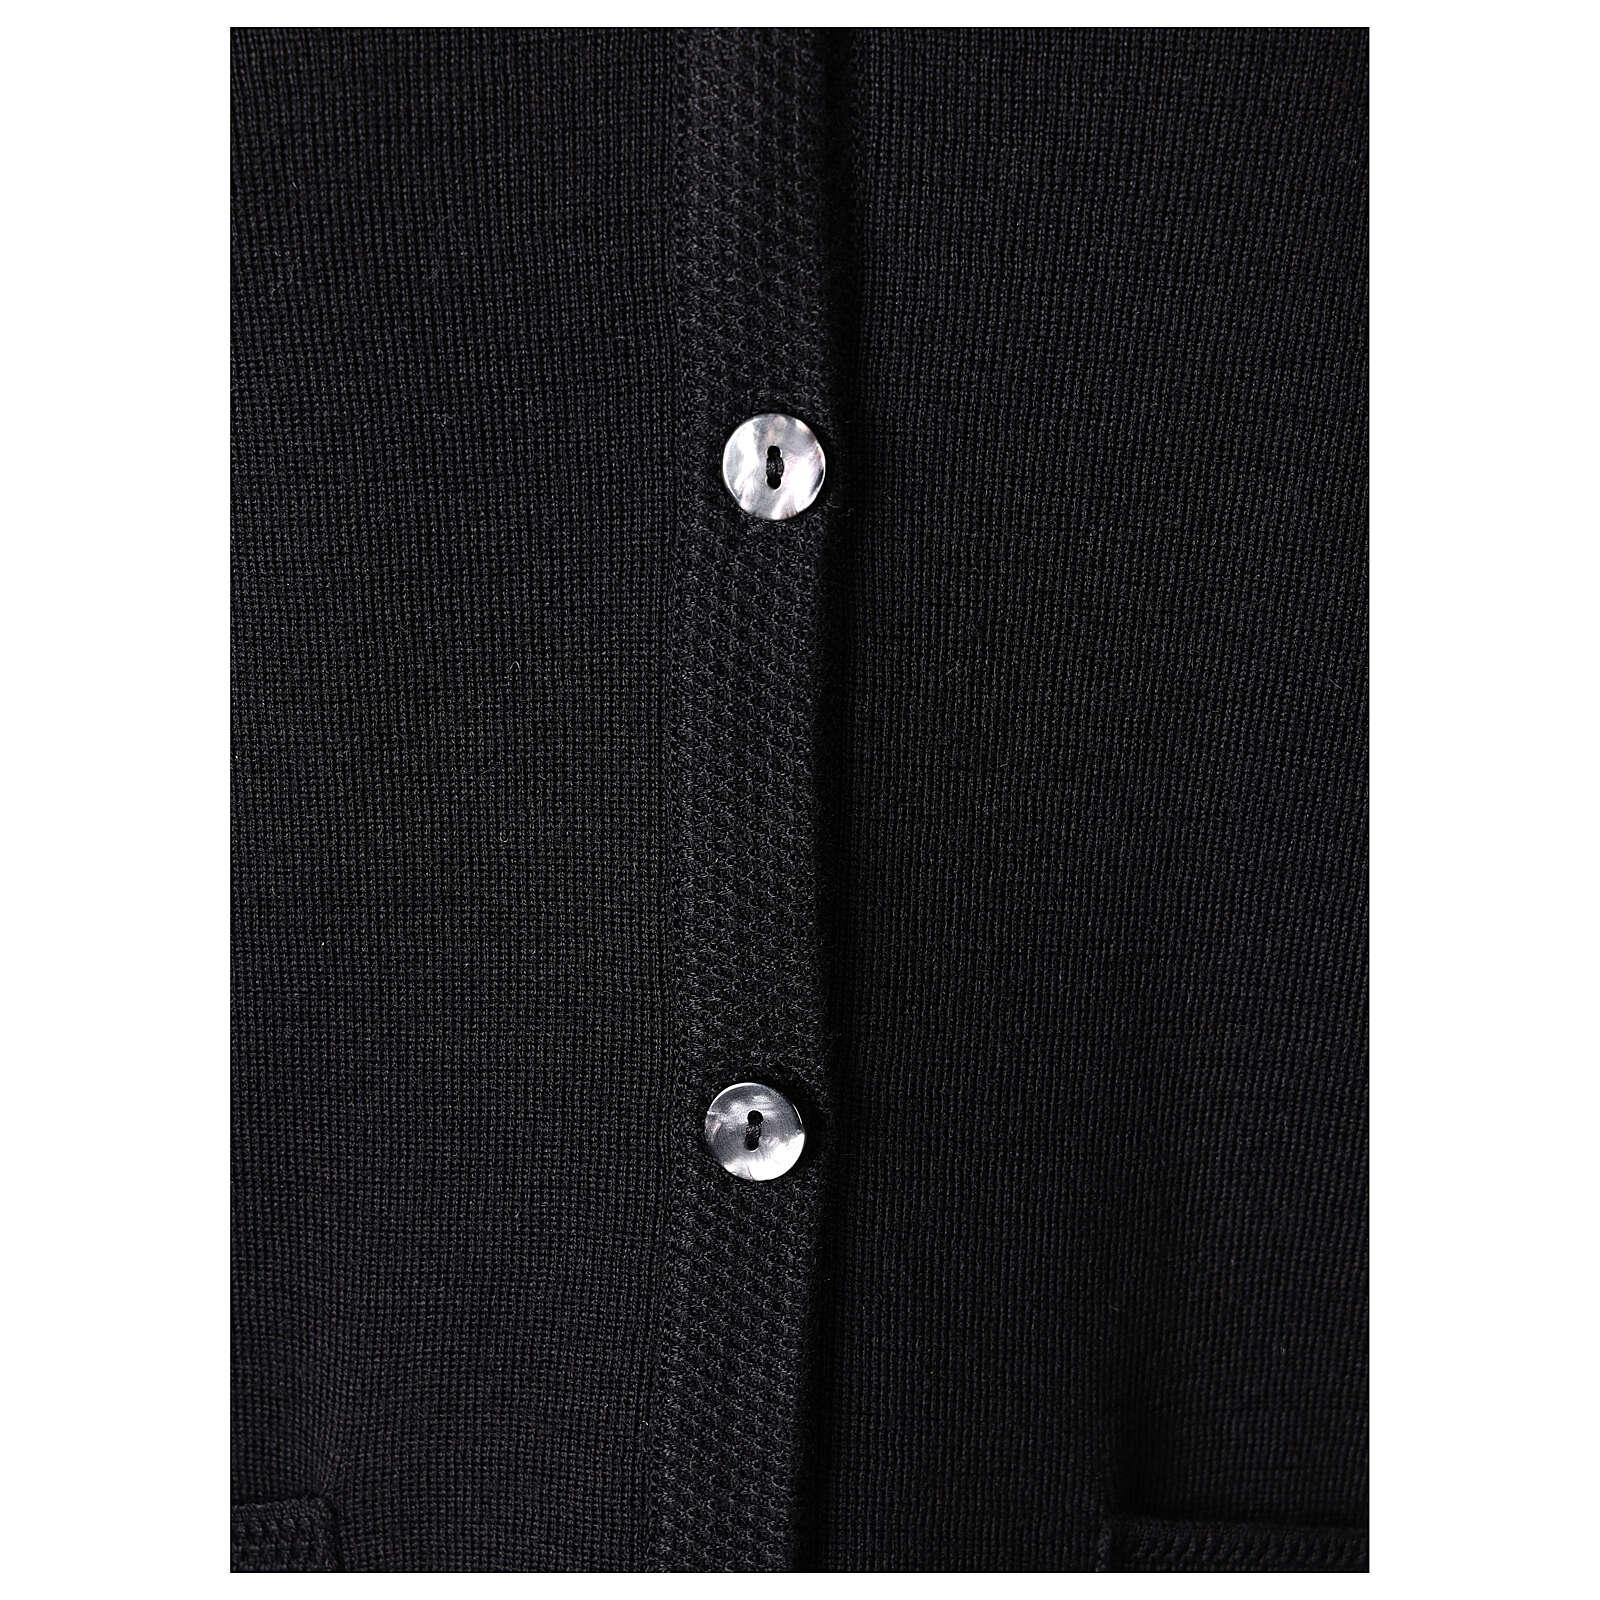 Cardigan soeur noir col en V poches jersey 50% acrylique 50 laine mérinos In Primis 4